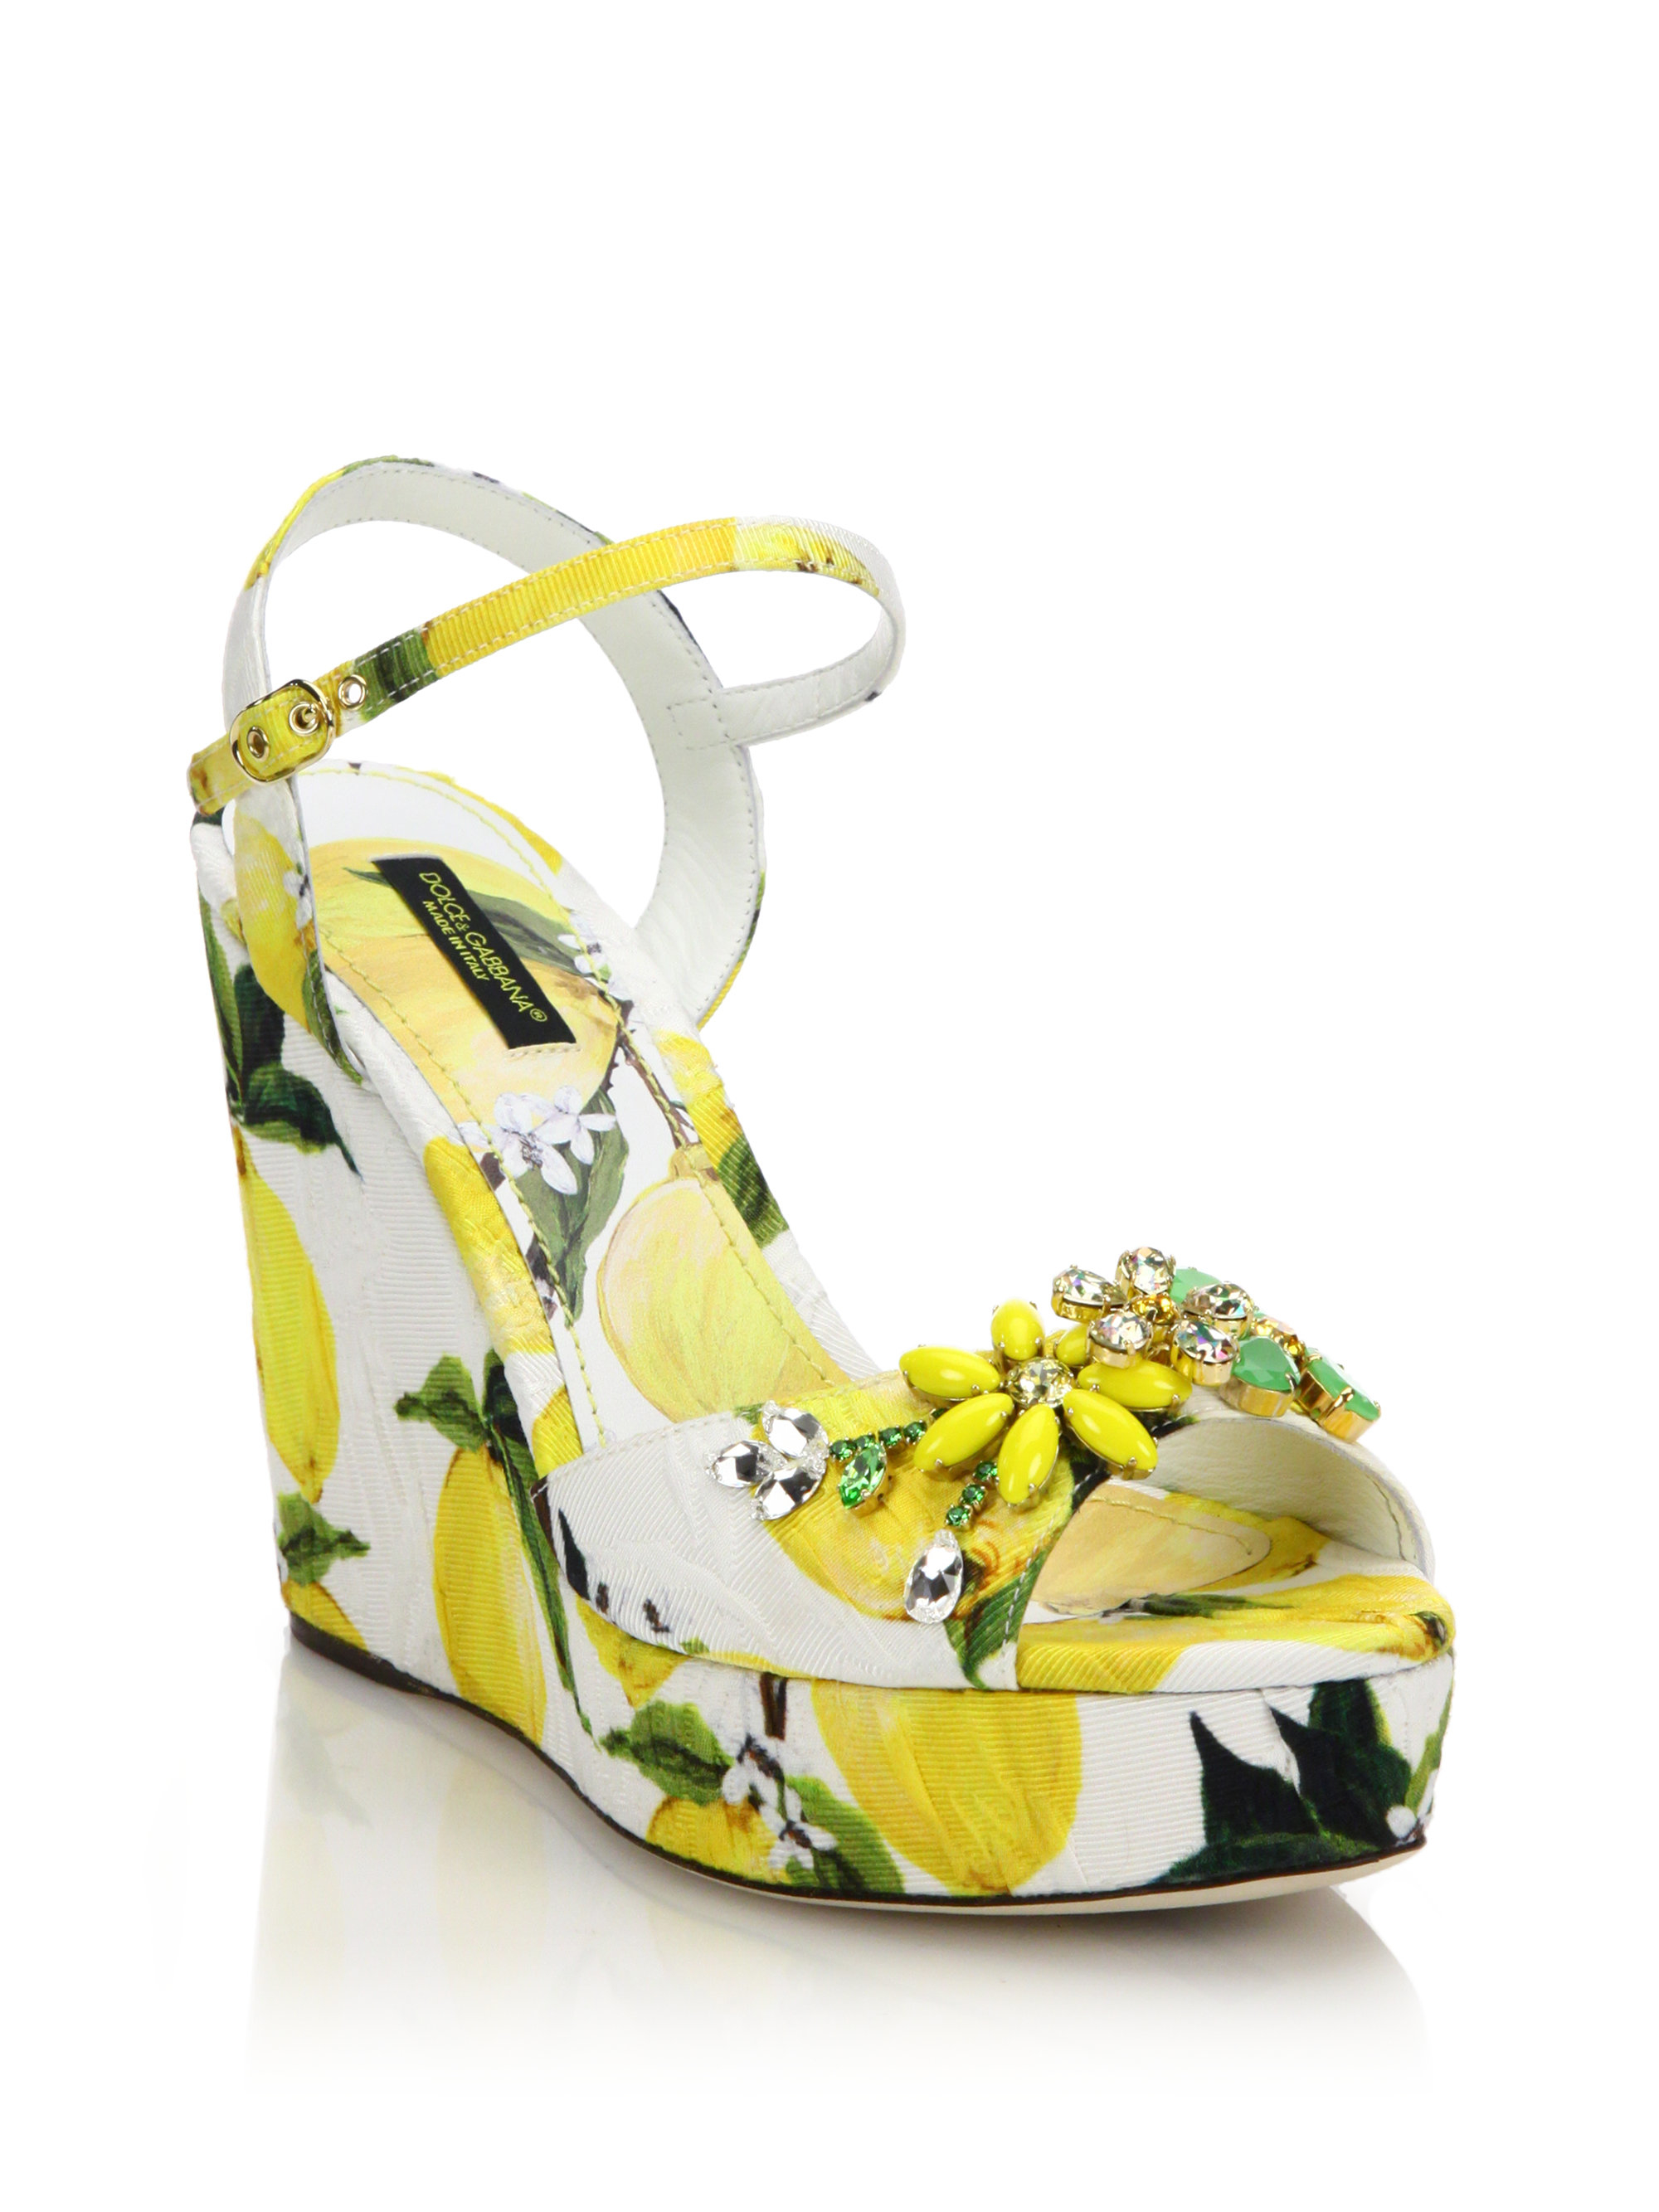 Dolce & Gabbana Embellished Patent-Leather Platform Sandals O32yz6VCHR